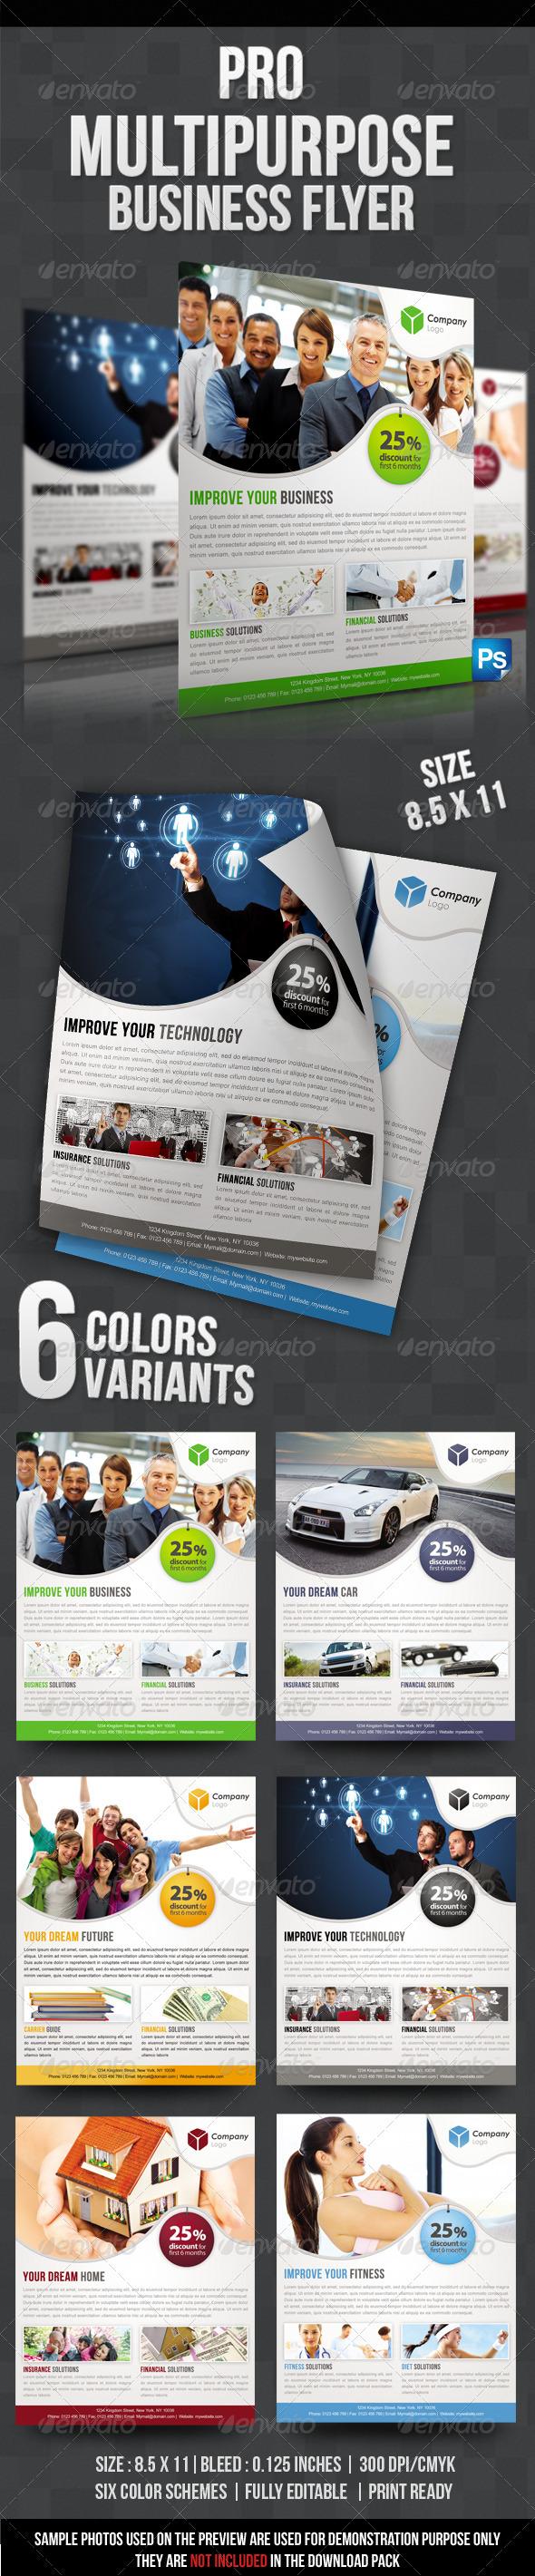 GraphicRiver Pro Multipurpose Business Flyer 3316928